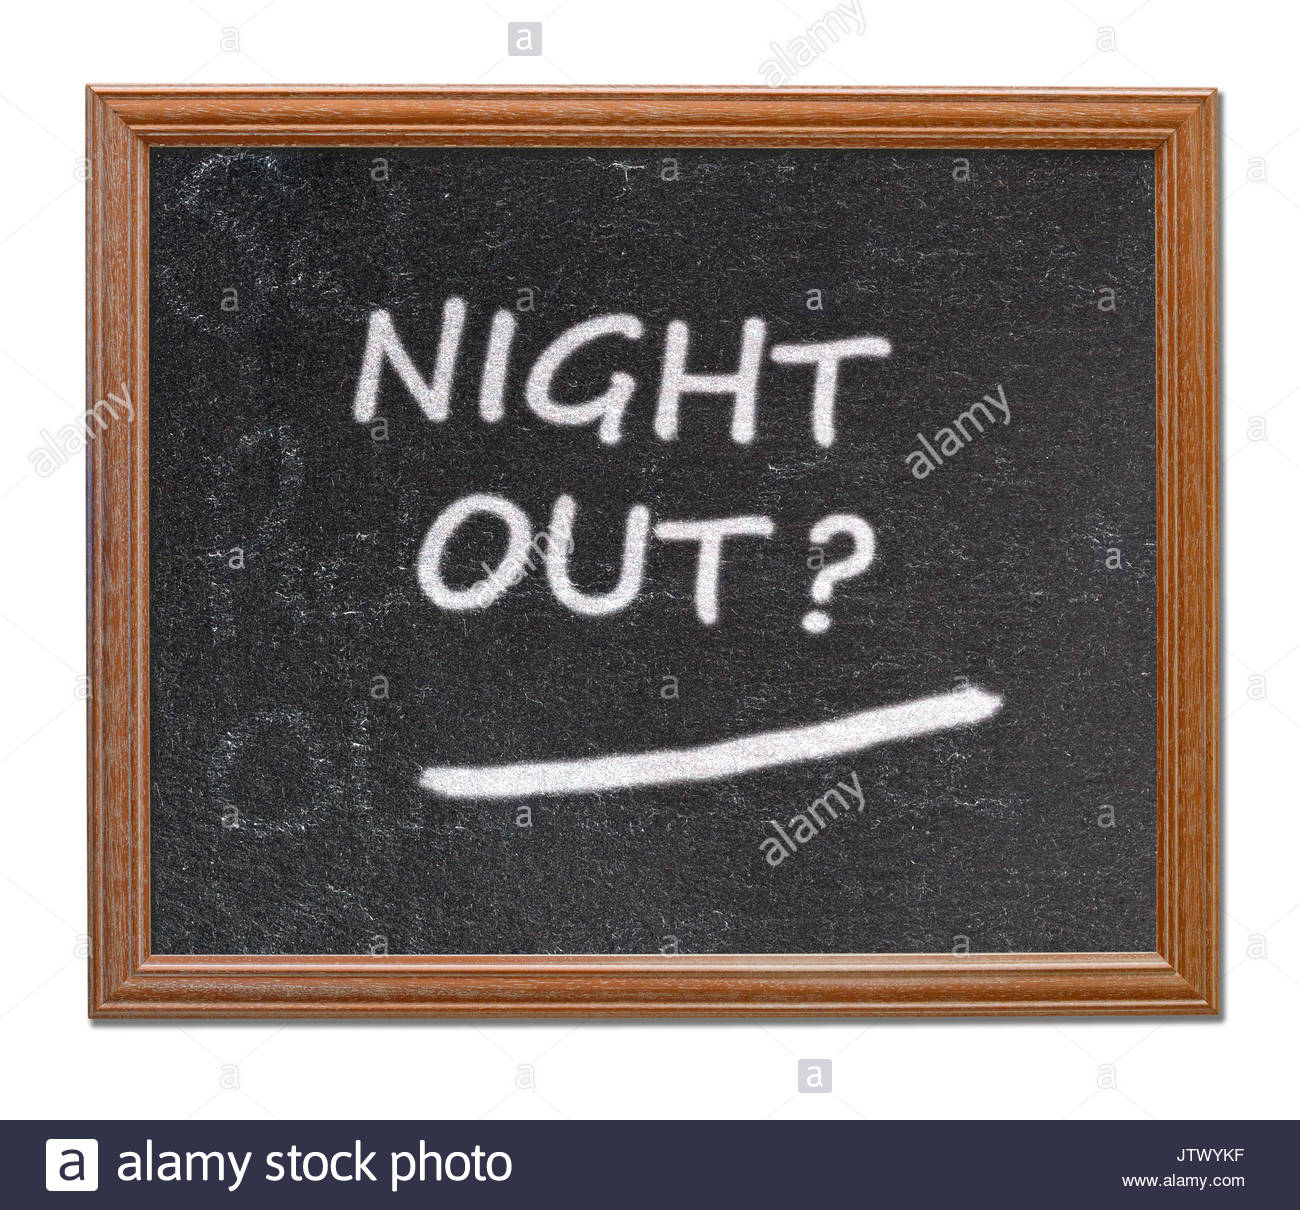 Night out? written on a blackboard, Blandford, Dorset, England, UK Stock Photo